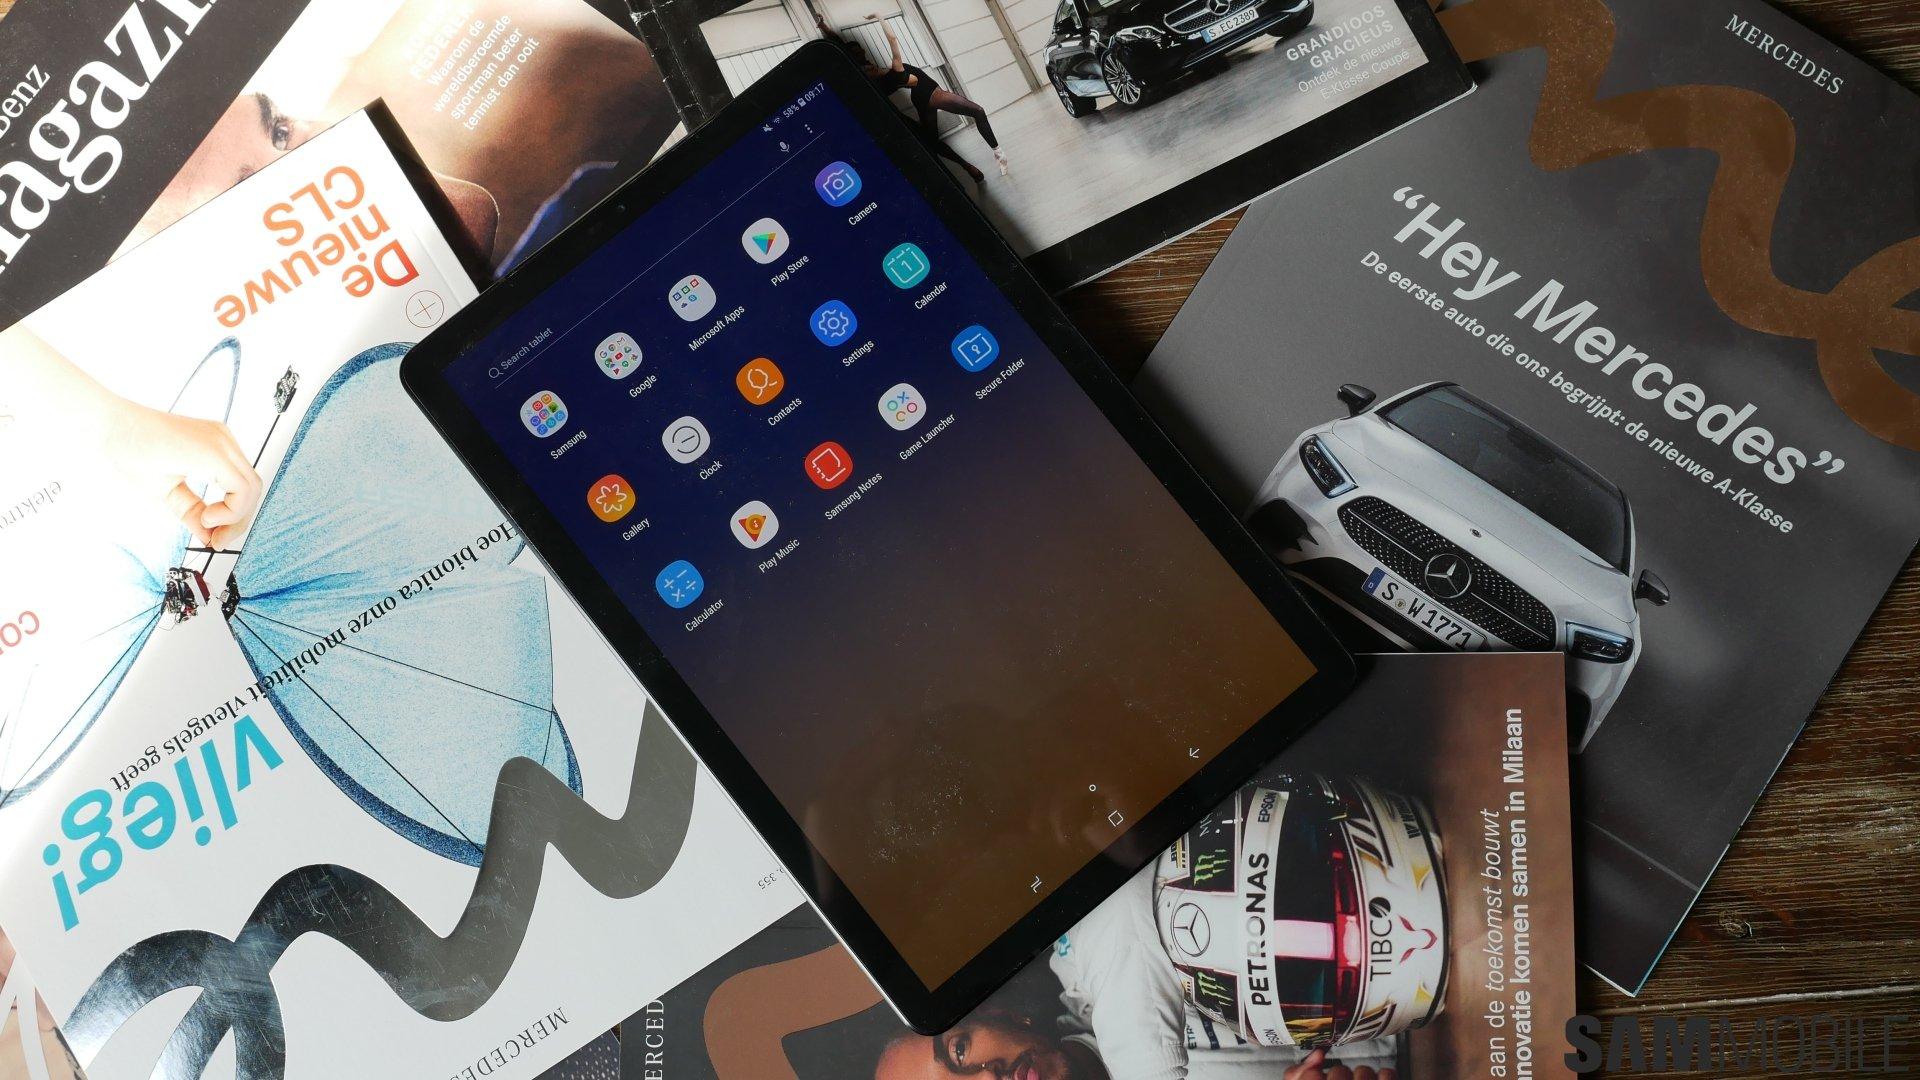 Specs comparison: Samsung Galaxy Tab S4 vs  Galaxy Tab S2